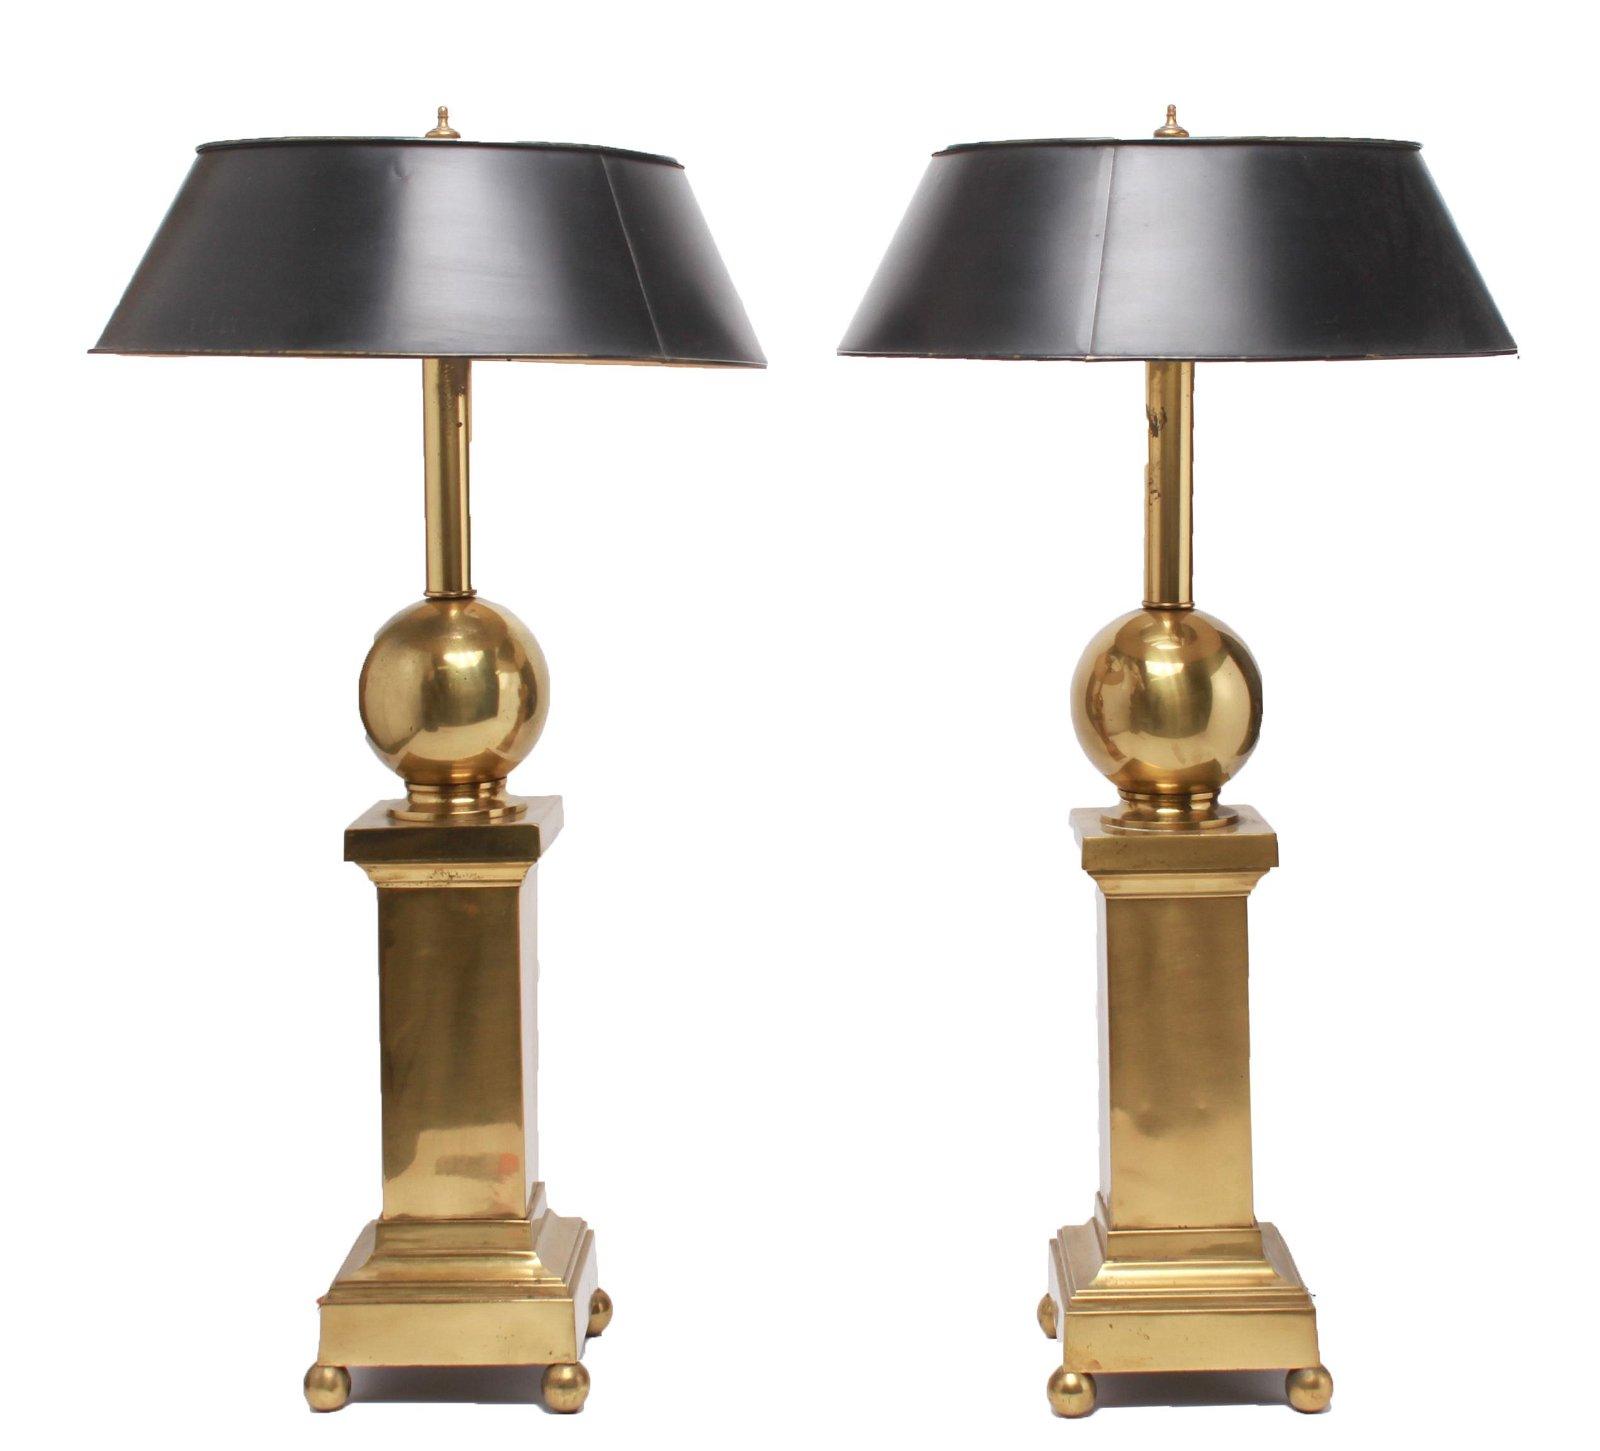 Hollywood Regency Brass Pedestal Table Lamps, Pair